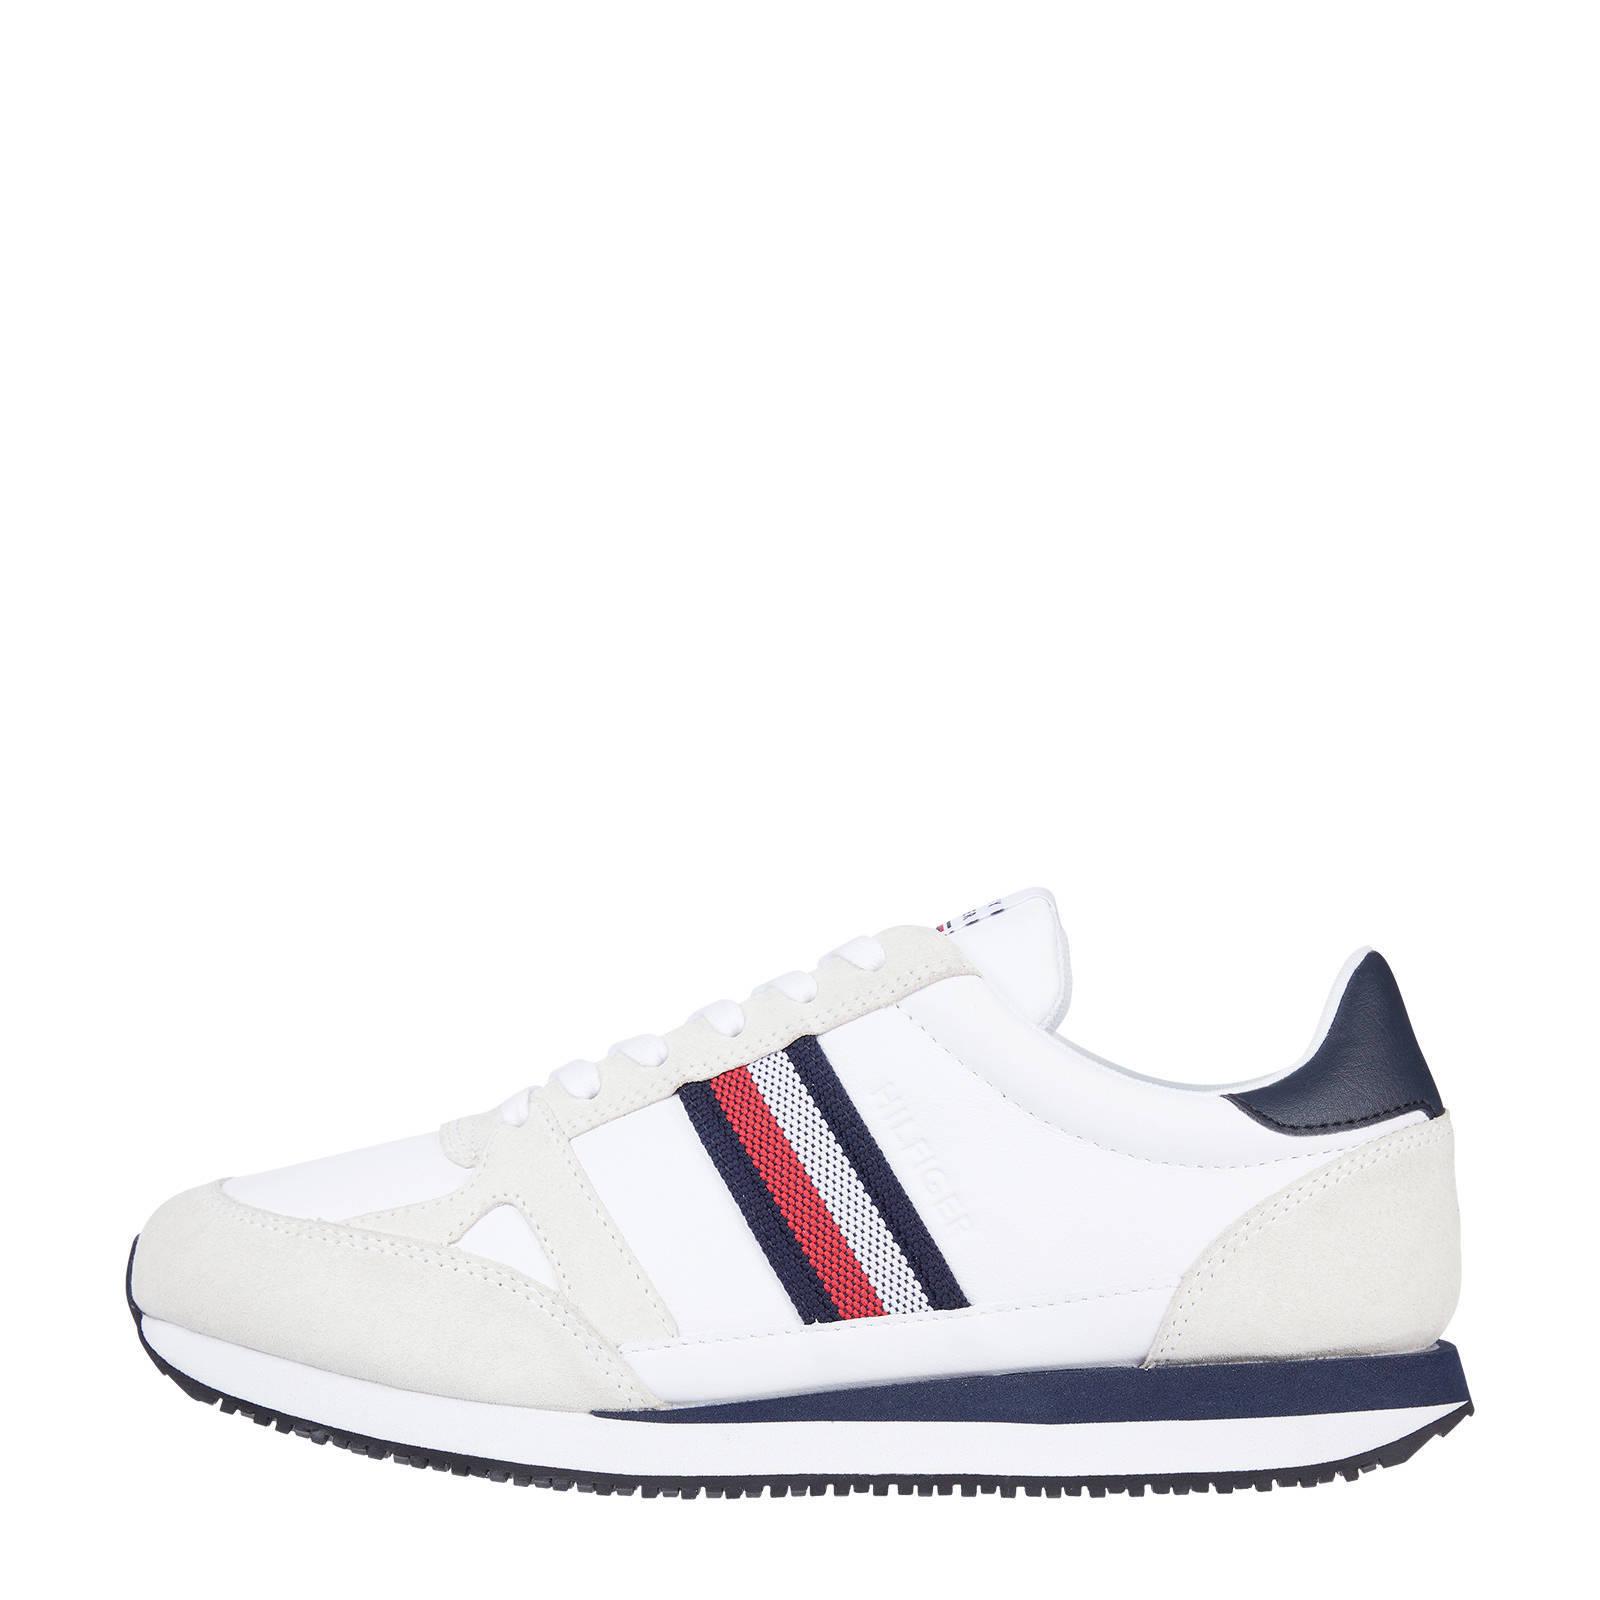 Tommy Hilfiger Runner Lo Leather Stripes leren sneakers donkerblauw online kopen